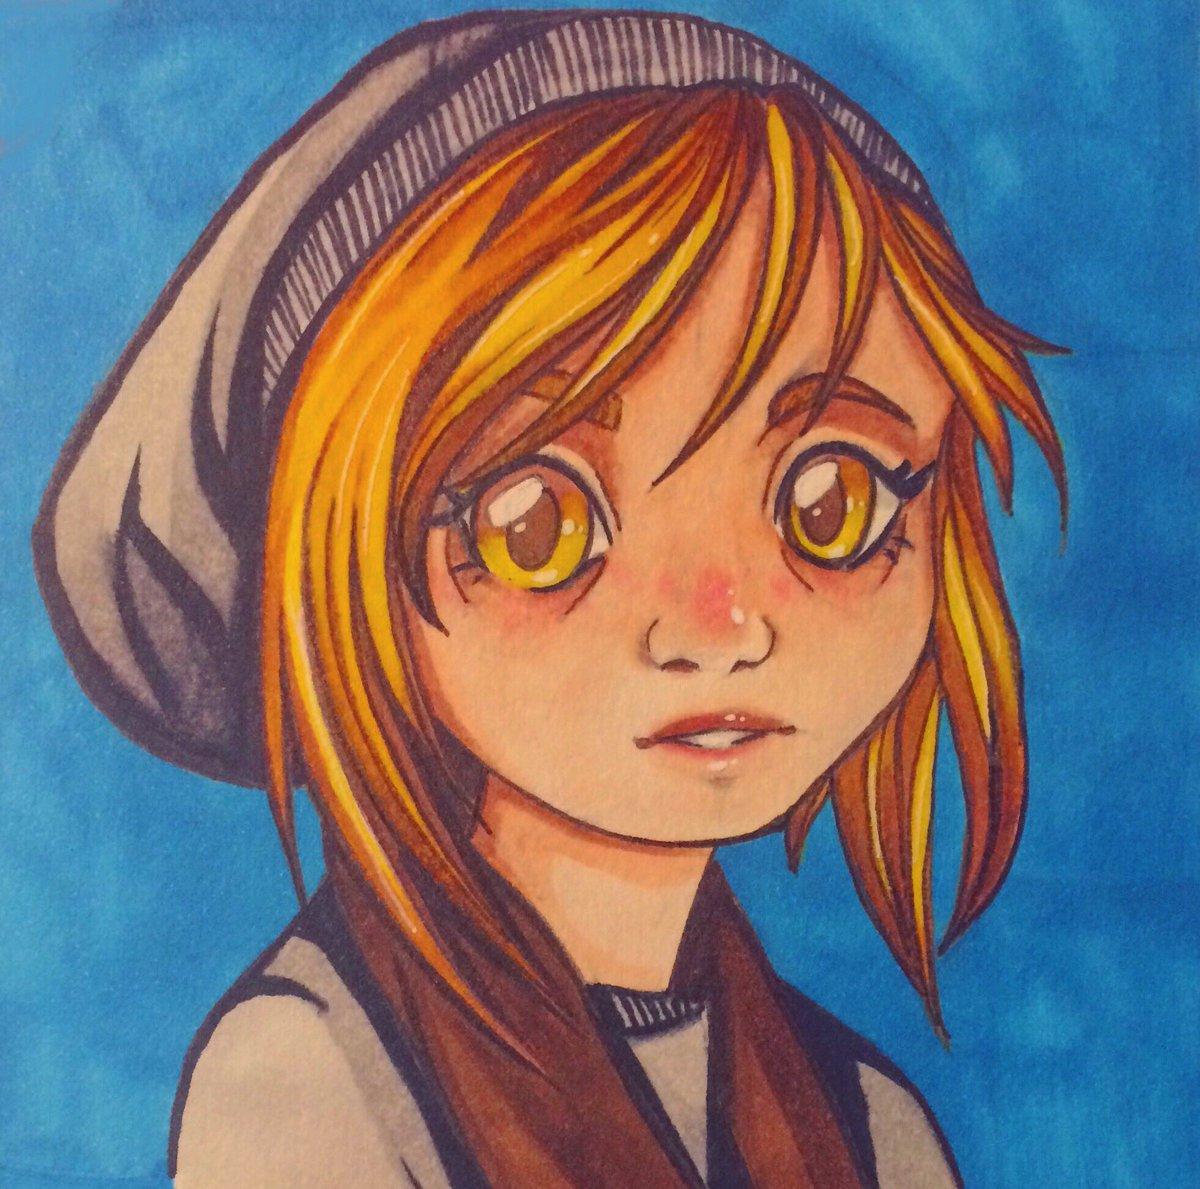 Just a quick drawing #myart #MyArtwork #ink #anime #AnimeArt https://t.co/EuFmhv7XJK